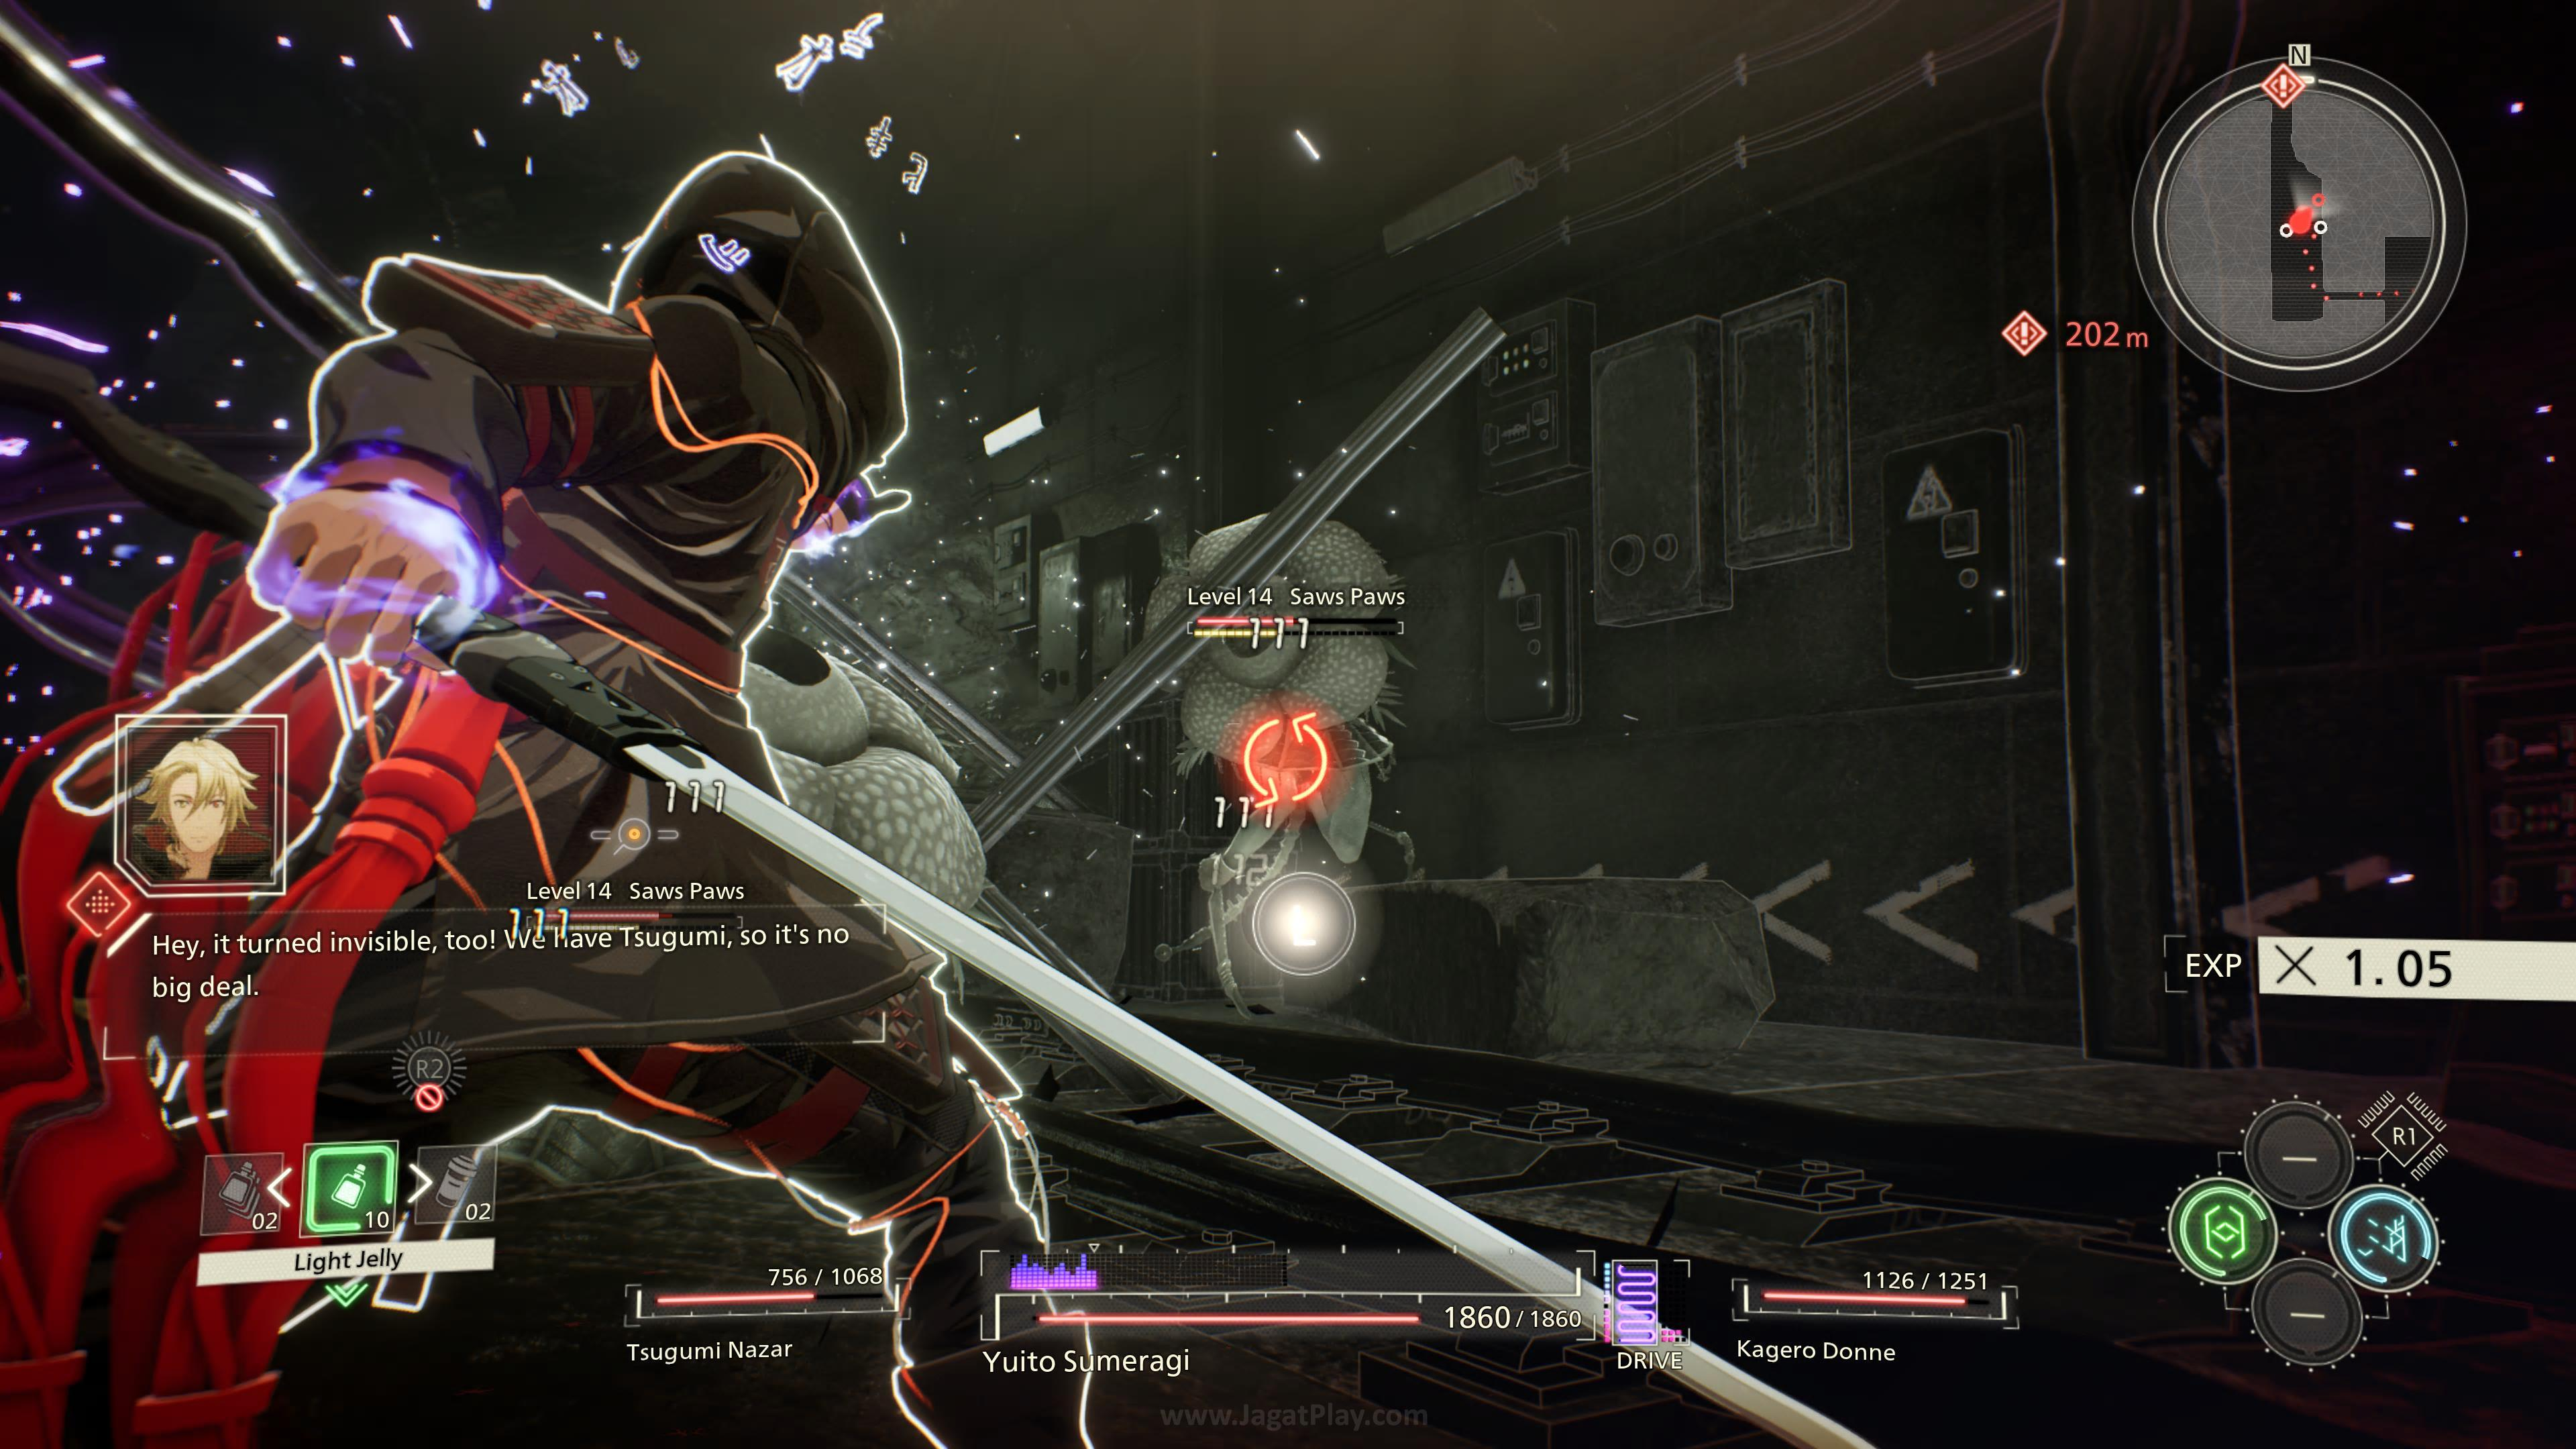 Scarlet Nexus jagatplay part 1 70